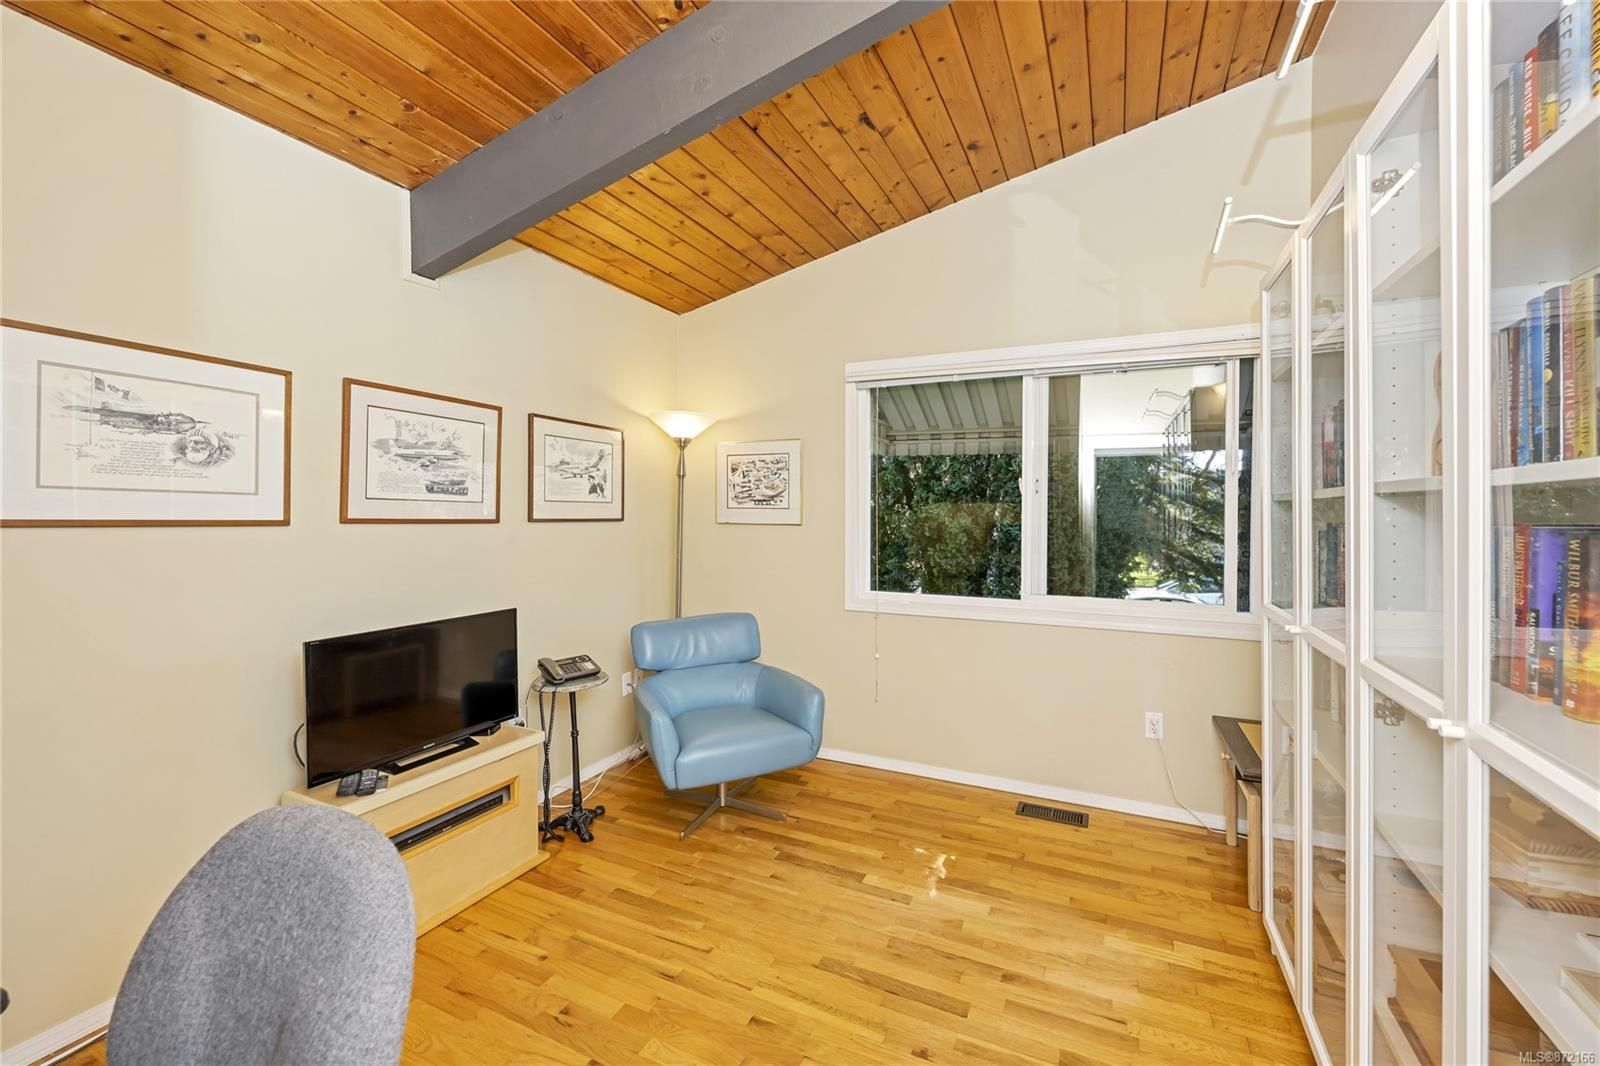 Photo 15: Photos: 1690 Blair Ave in : SE Lambrick Park House for sale (Saanich East)  : MLS®# 872166